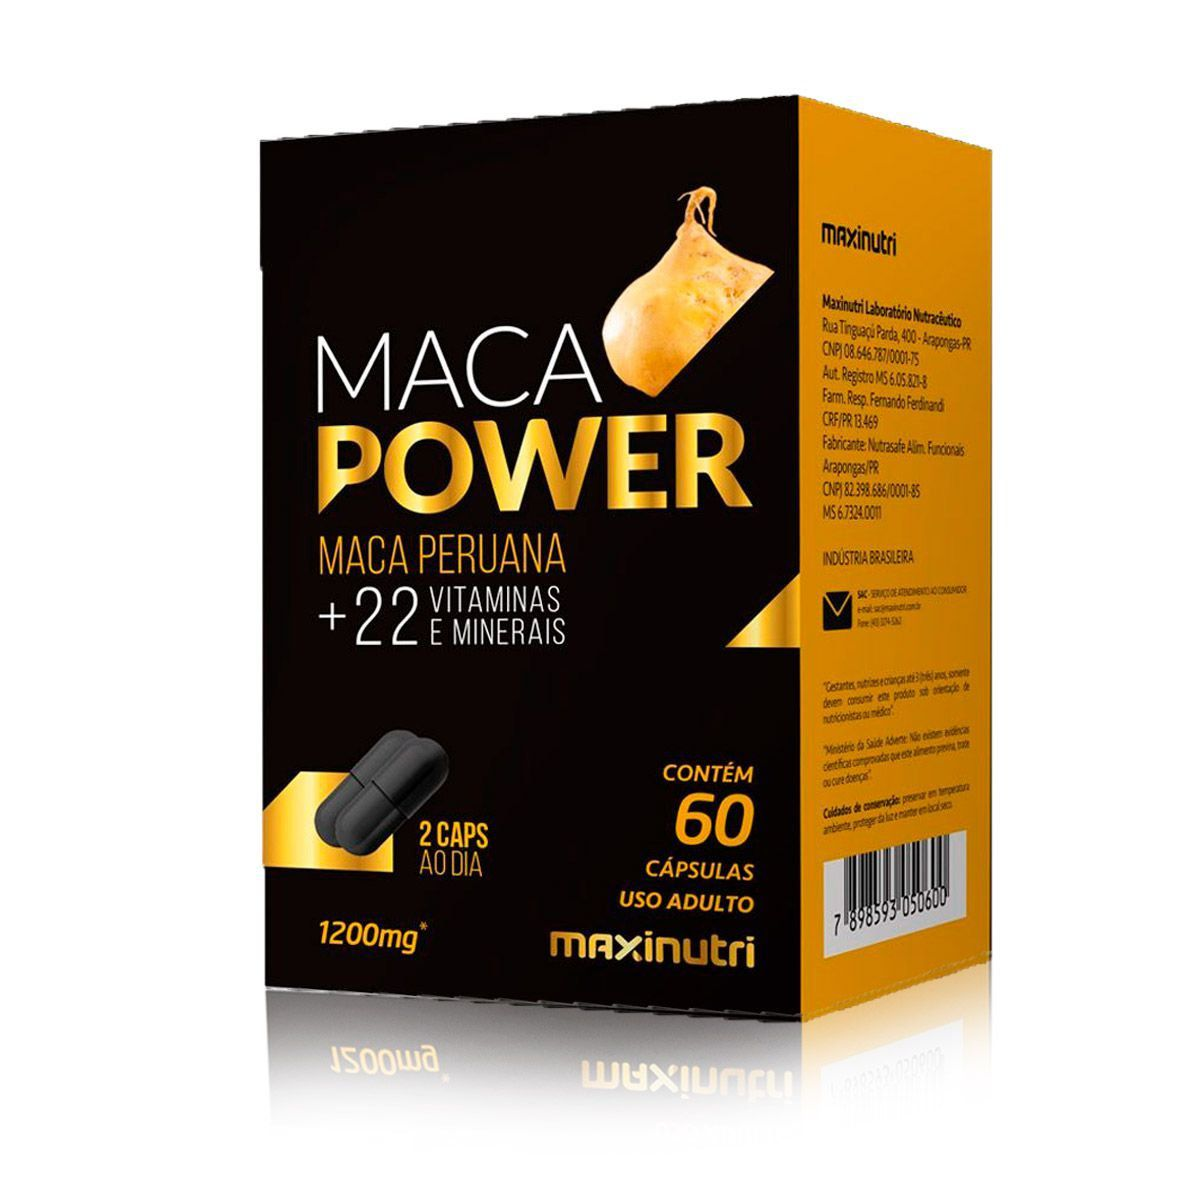 Maca Power Maca Peruana 60 Caps - Maxinutri